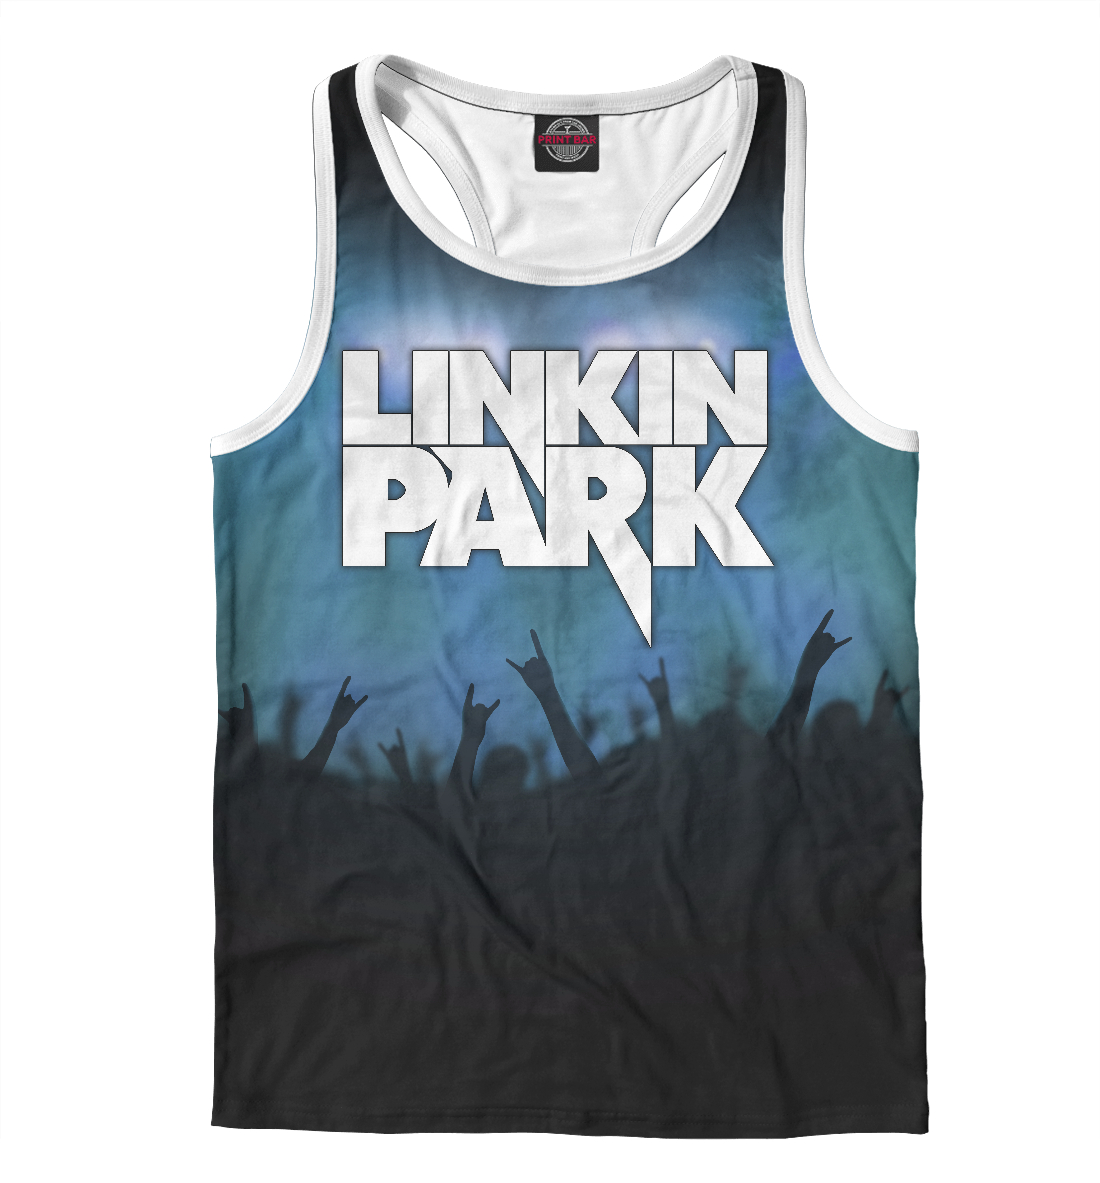 Купить Linkin Park, Printbar, Майки борцовки, LIN-991451-mayb-2